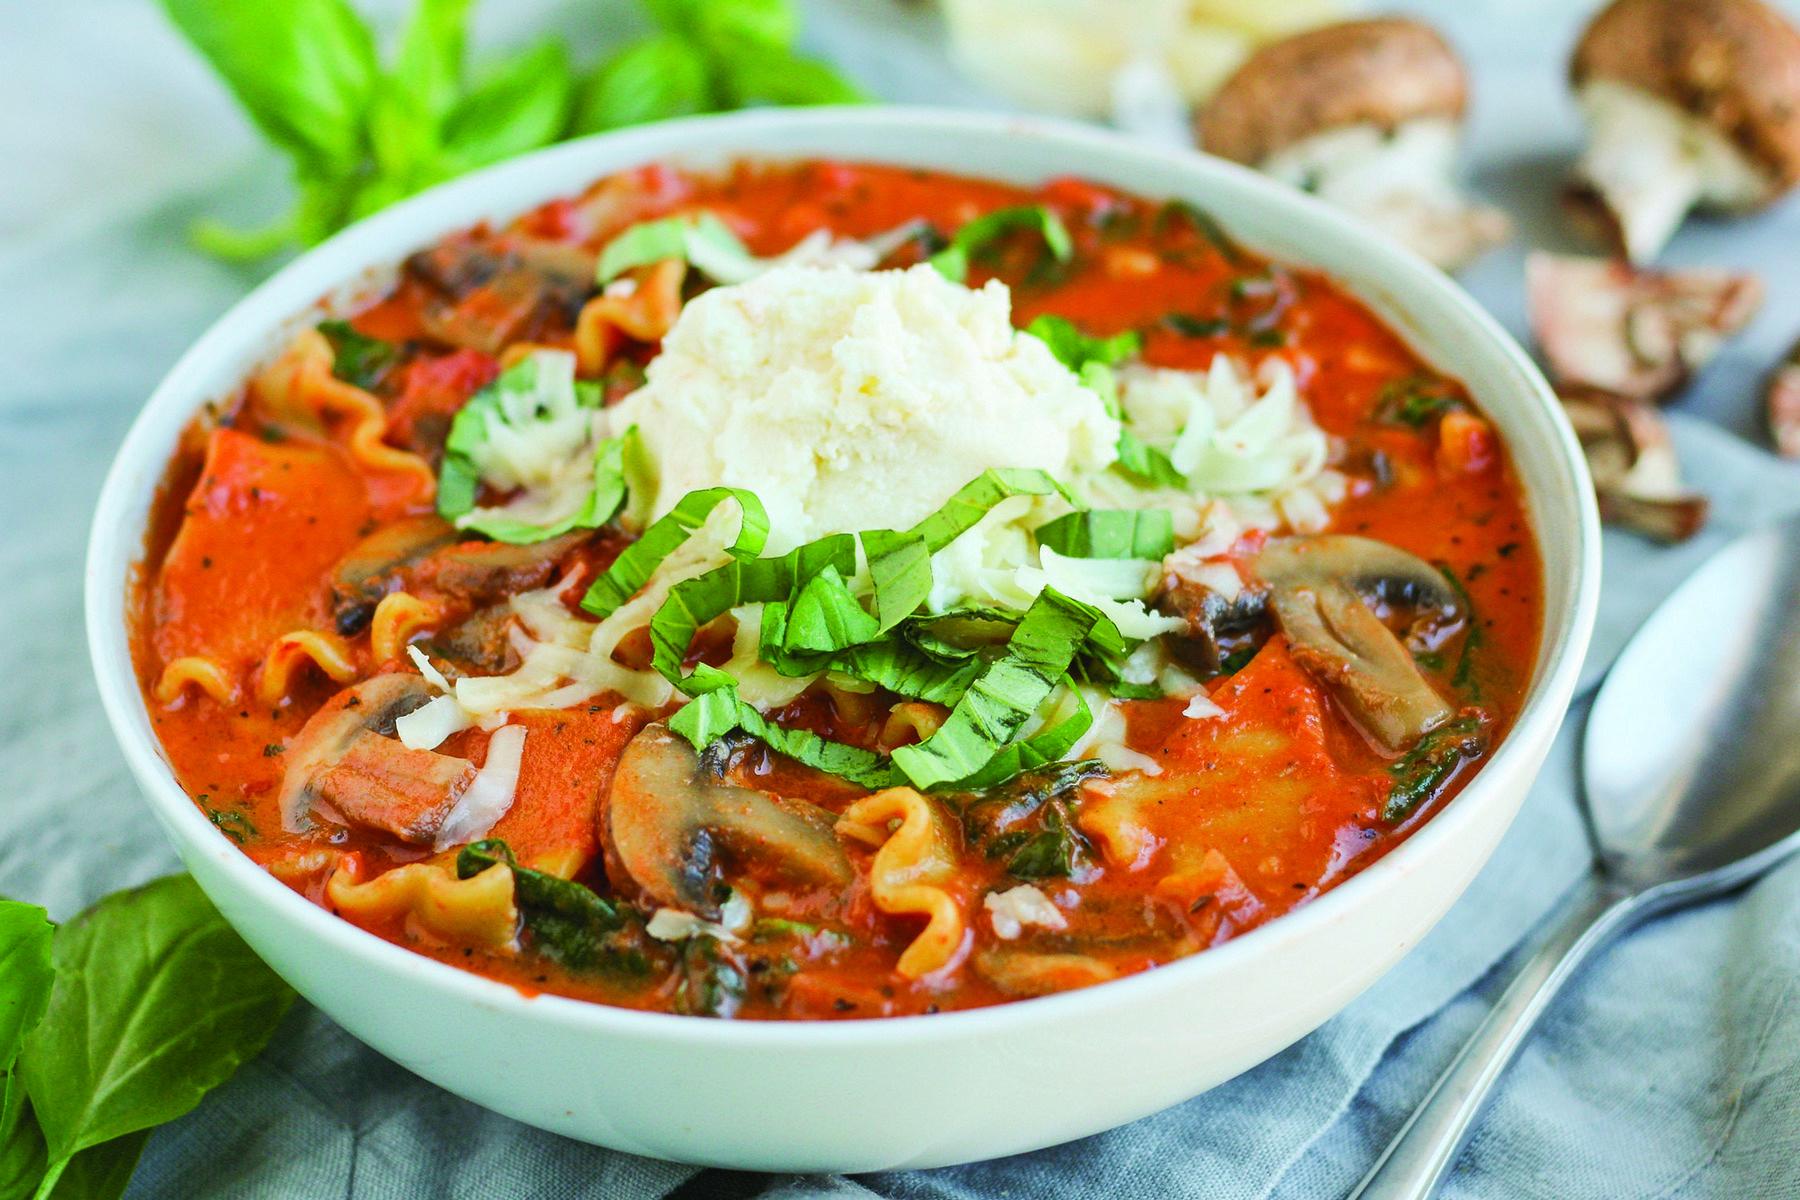 Creamy Spinach, Mushroom and Lasagna Soup